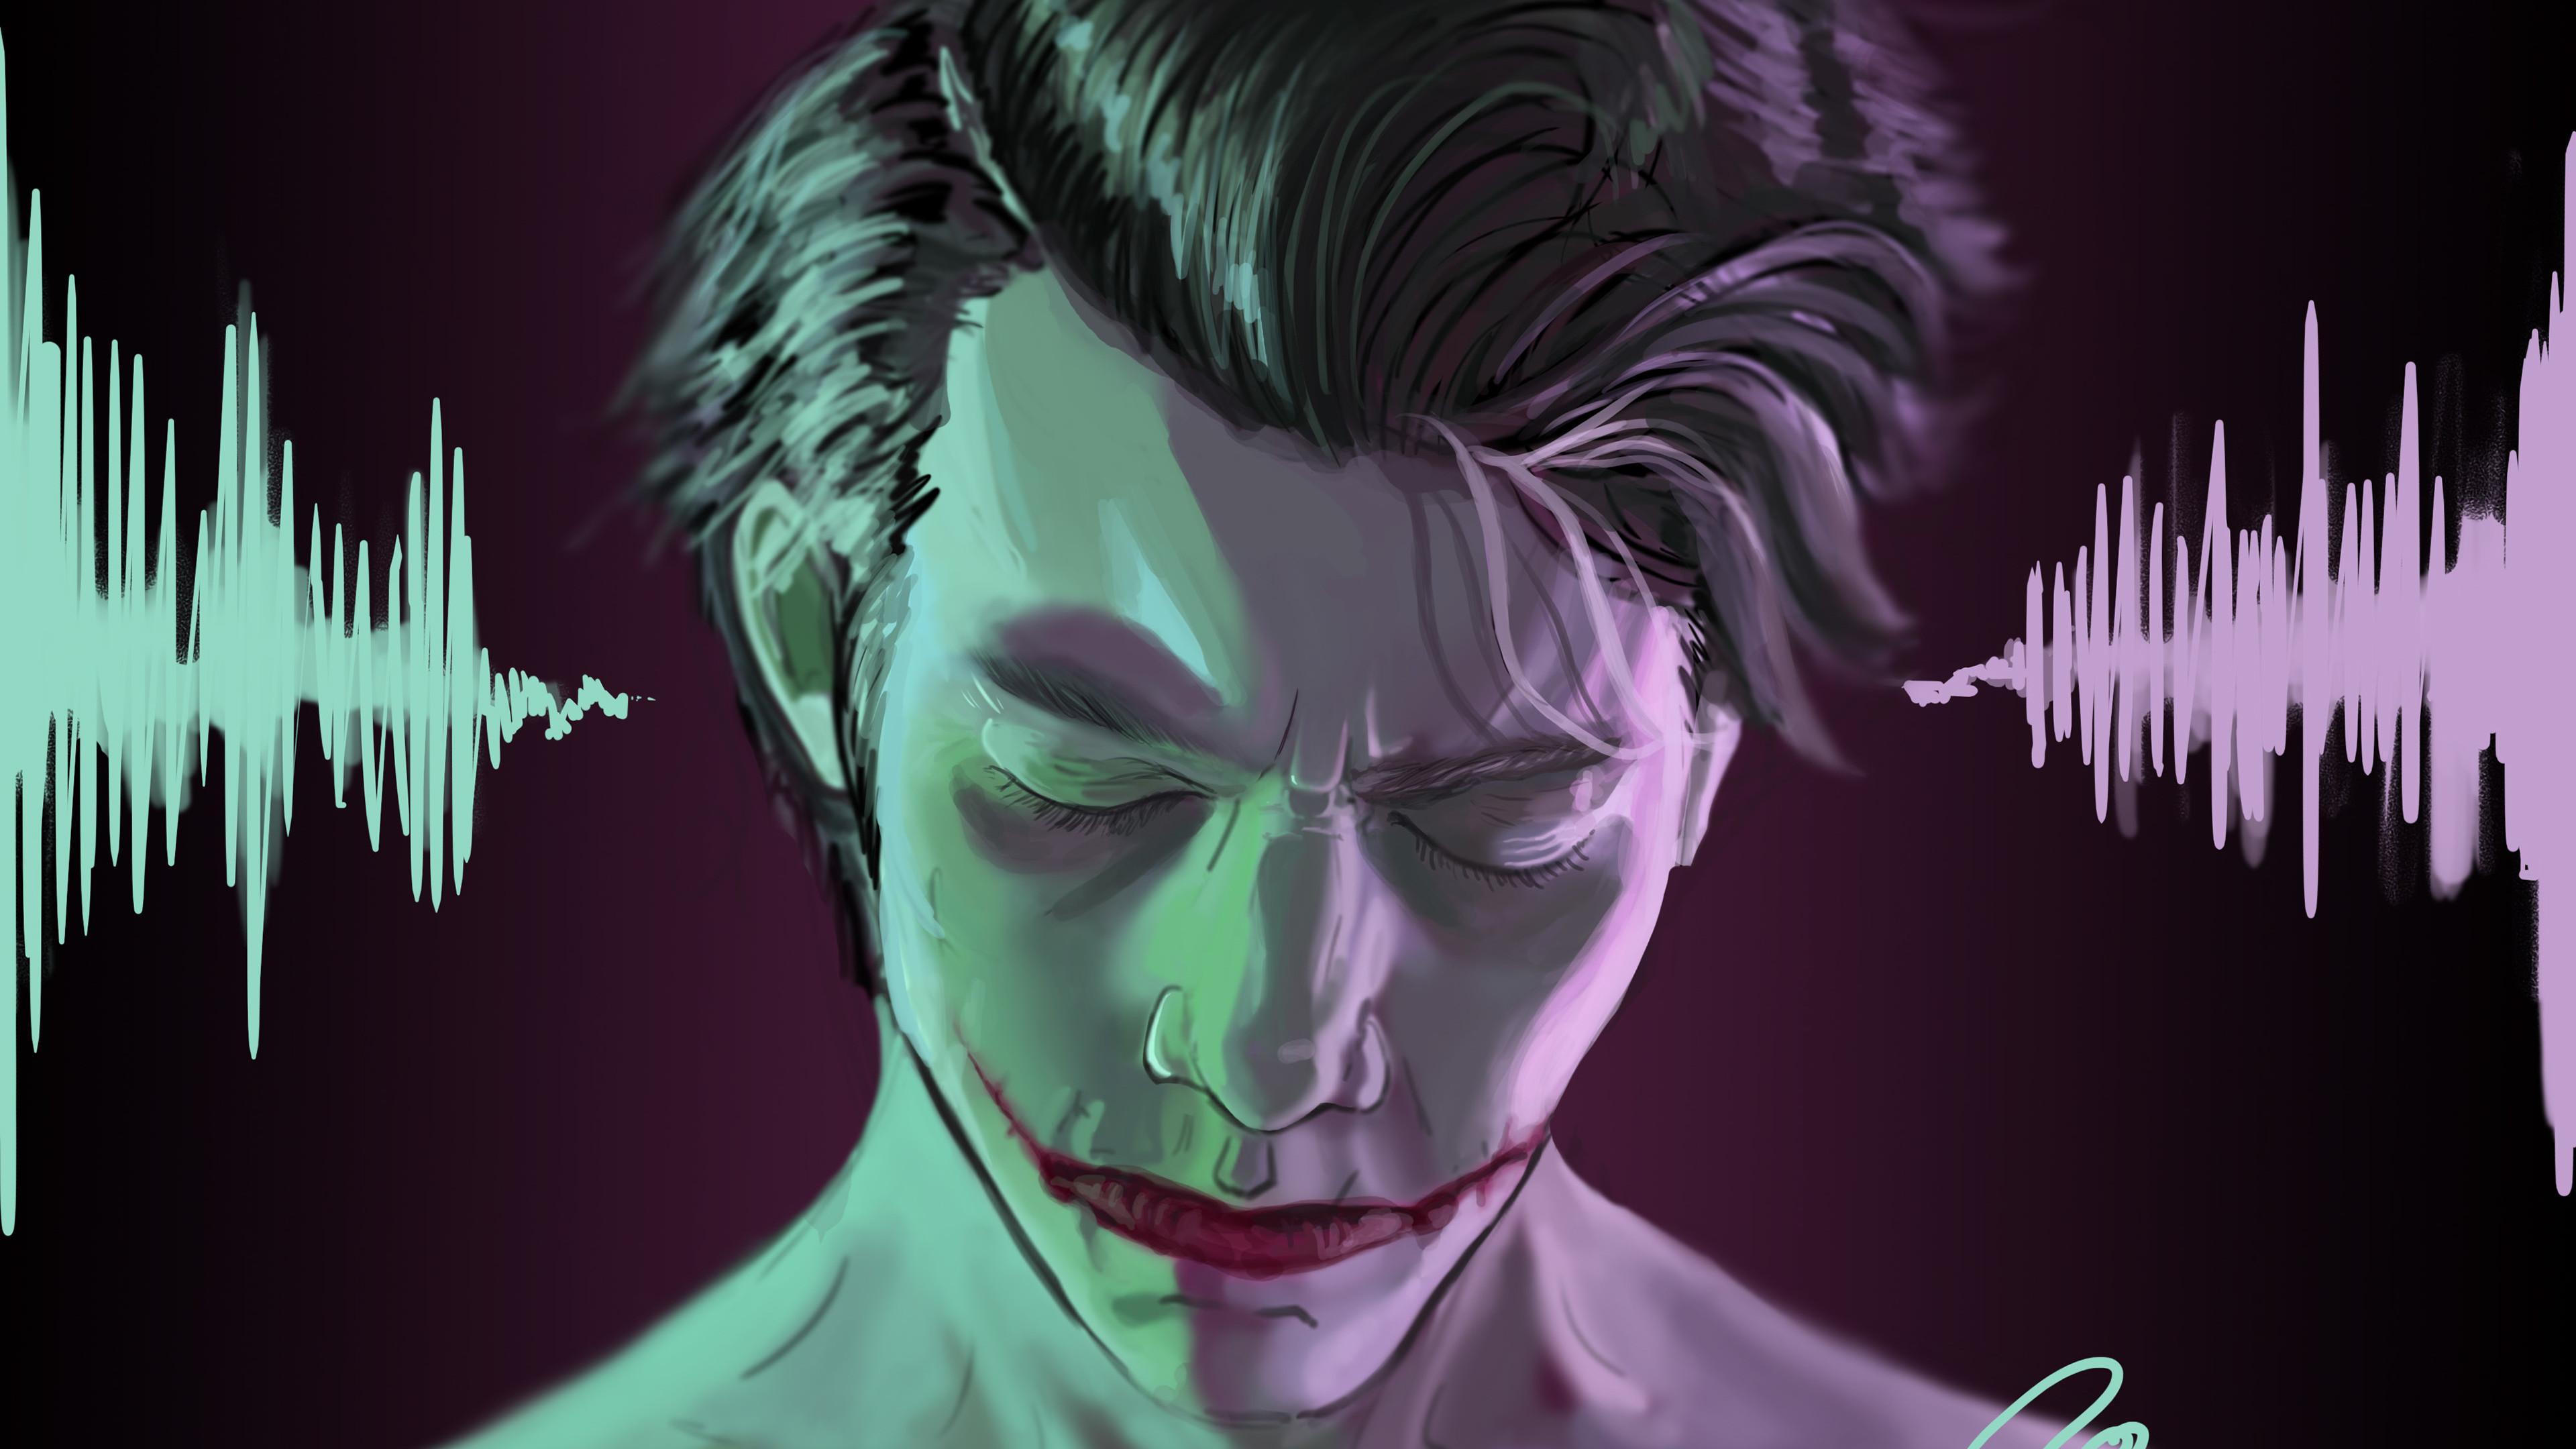 sensitive side joker 1543620287 - Sensitive Side Joker - supervillain wallpapers, superheroes wallpapers, joker wallpapers, hd-wallpapers, digital art wallpapers, behance wallpapers, artwork wallpapers, artist wallpapers, 4k-wallpapers